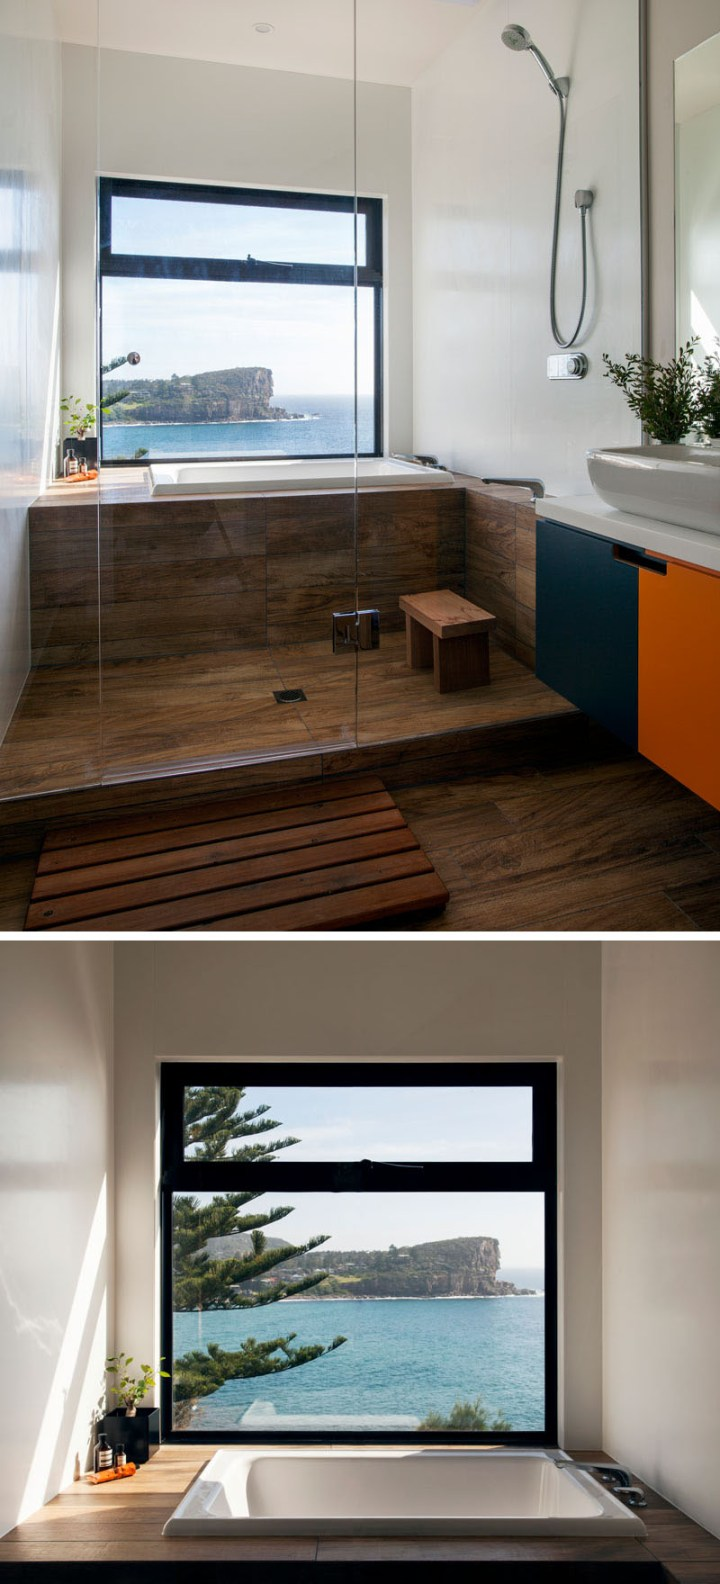 casa-cu-acoperis-natural-green-roof-prefabricated-house-8